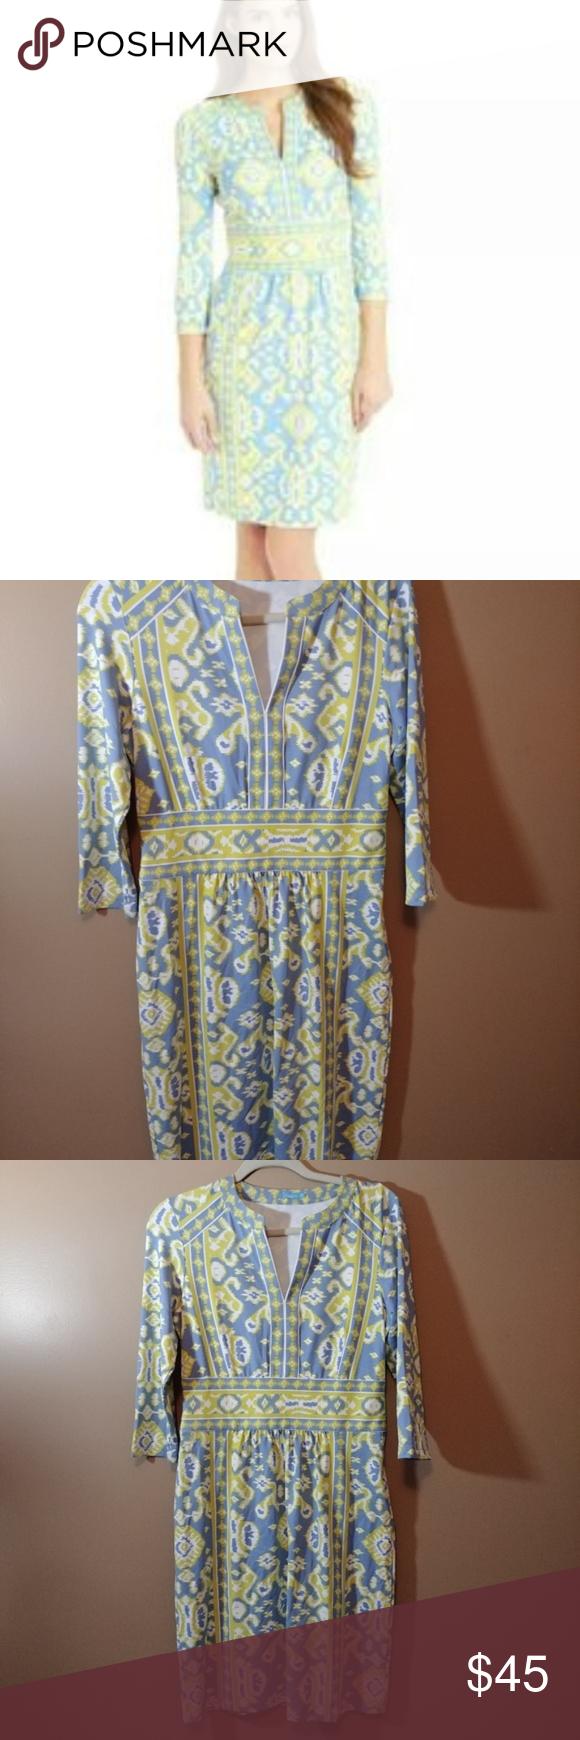 J Mclaughlin Lola Ikat Blue Yellow Dress Sz M Blue And Yellow Dress Yellow Dress Dresses [ 1740 x 580 Pixel ]